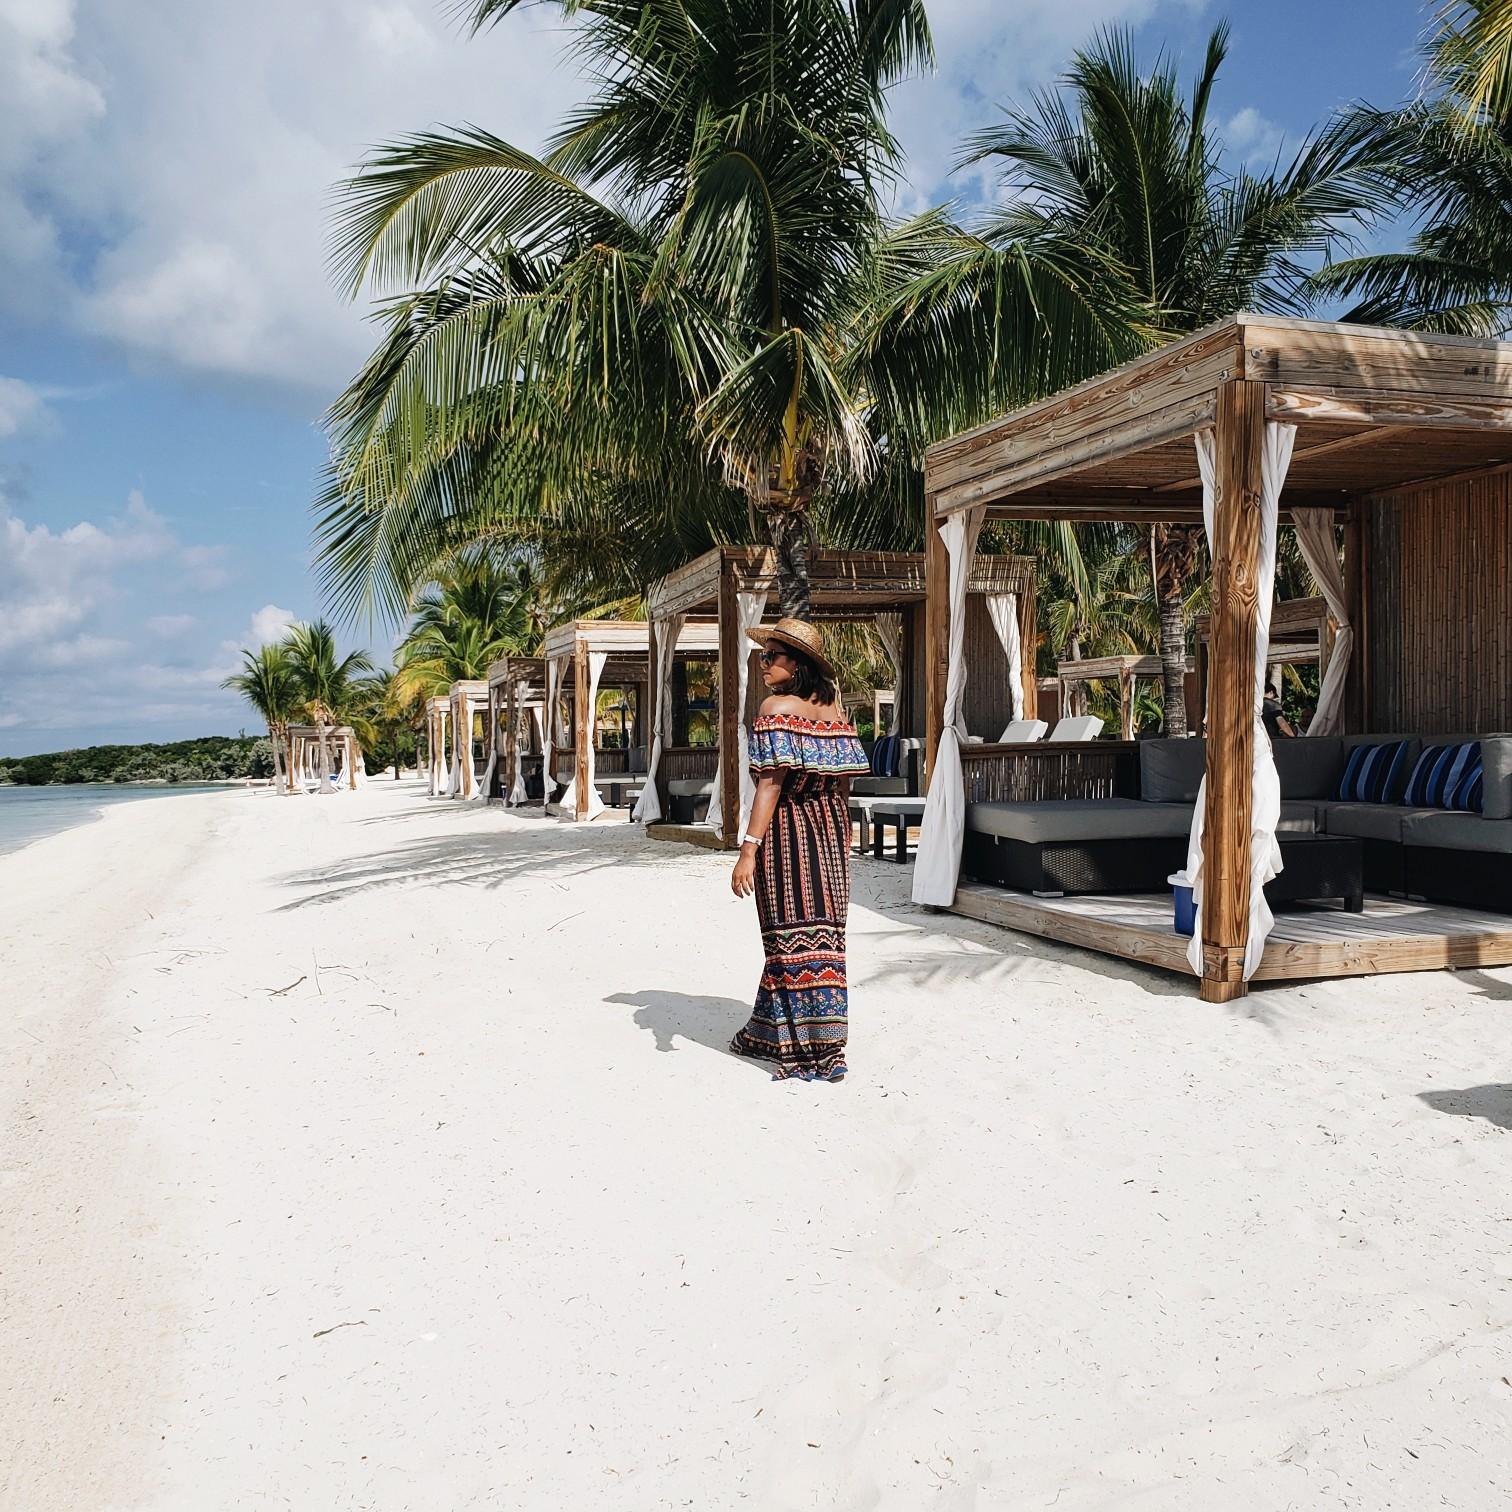 Travel Blogger Afroza Khan walking on beach near private cabanas in Bahamas